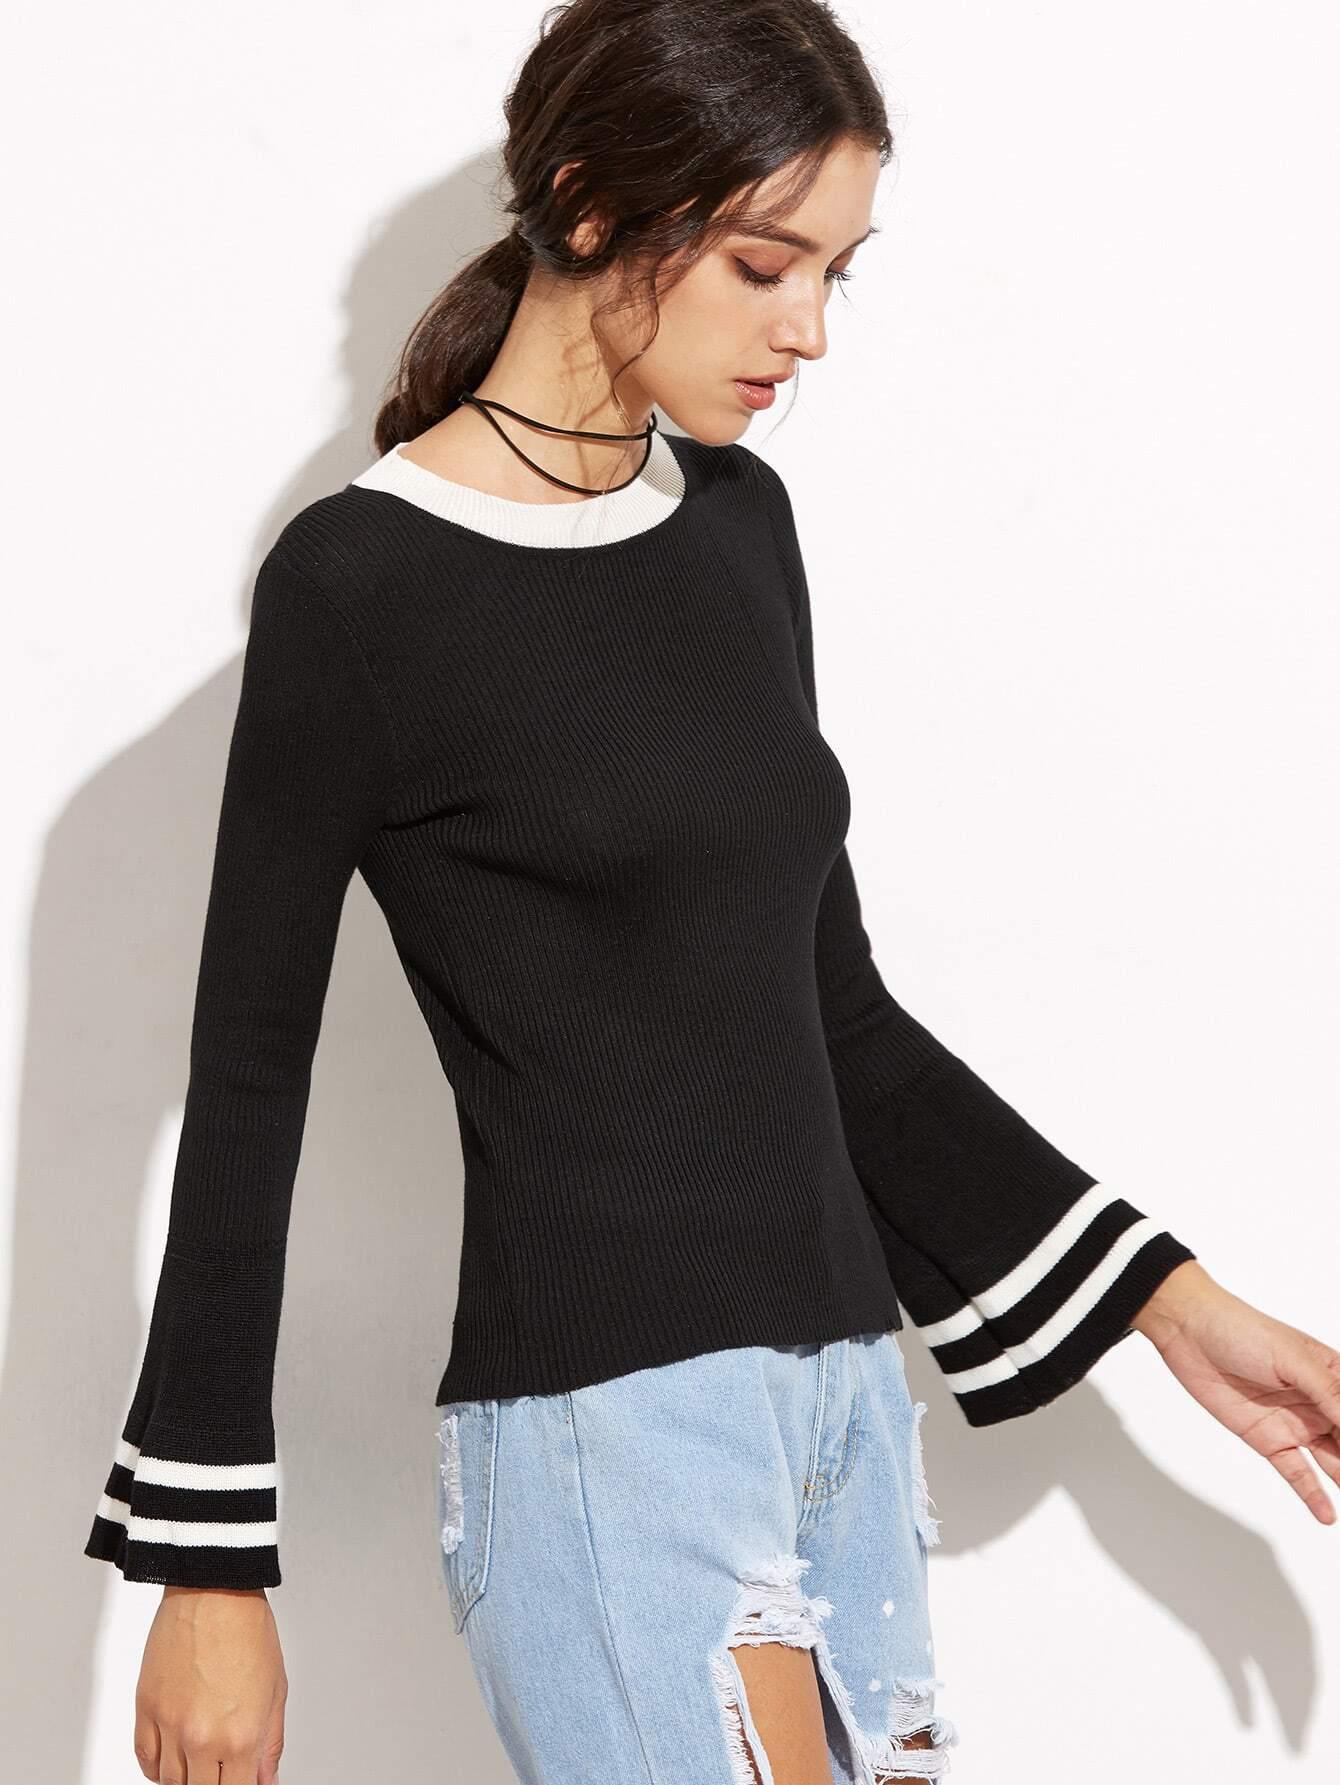 sweater160901001_2